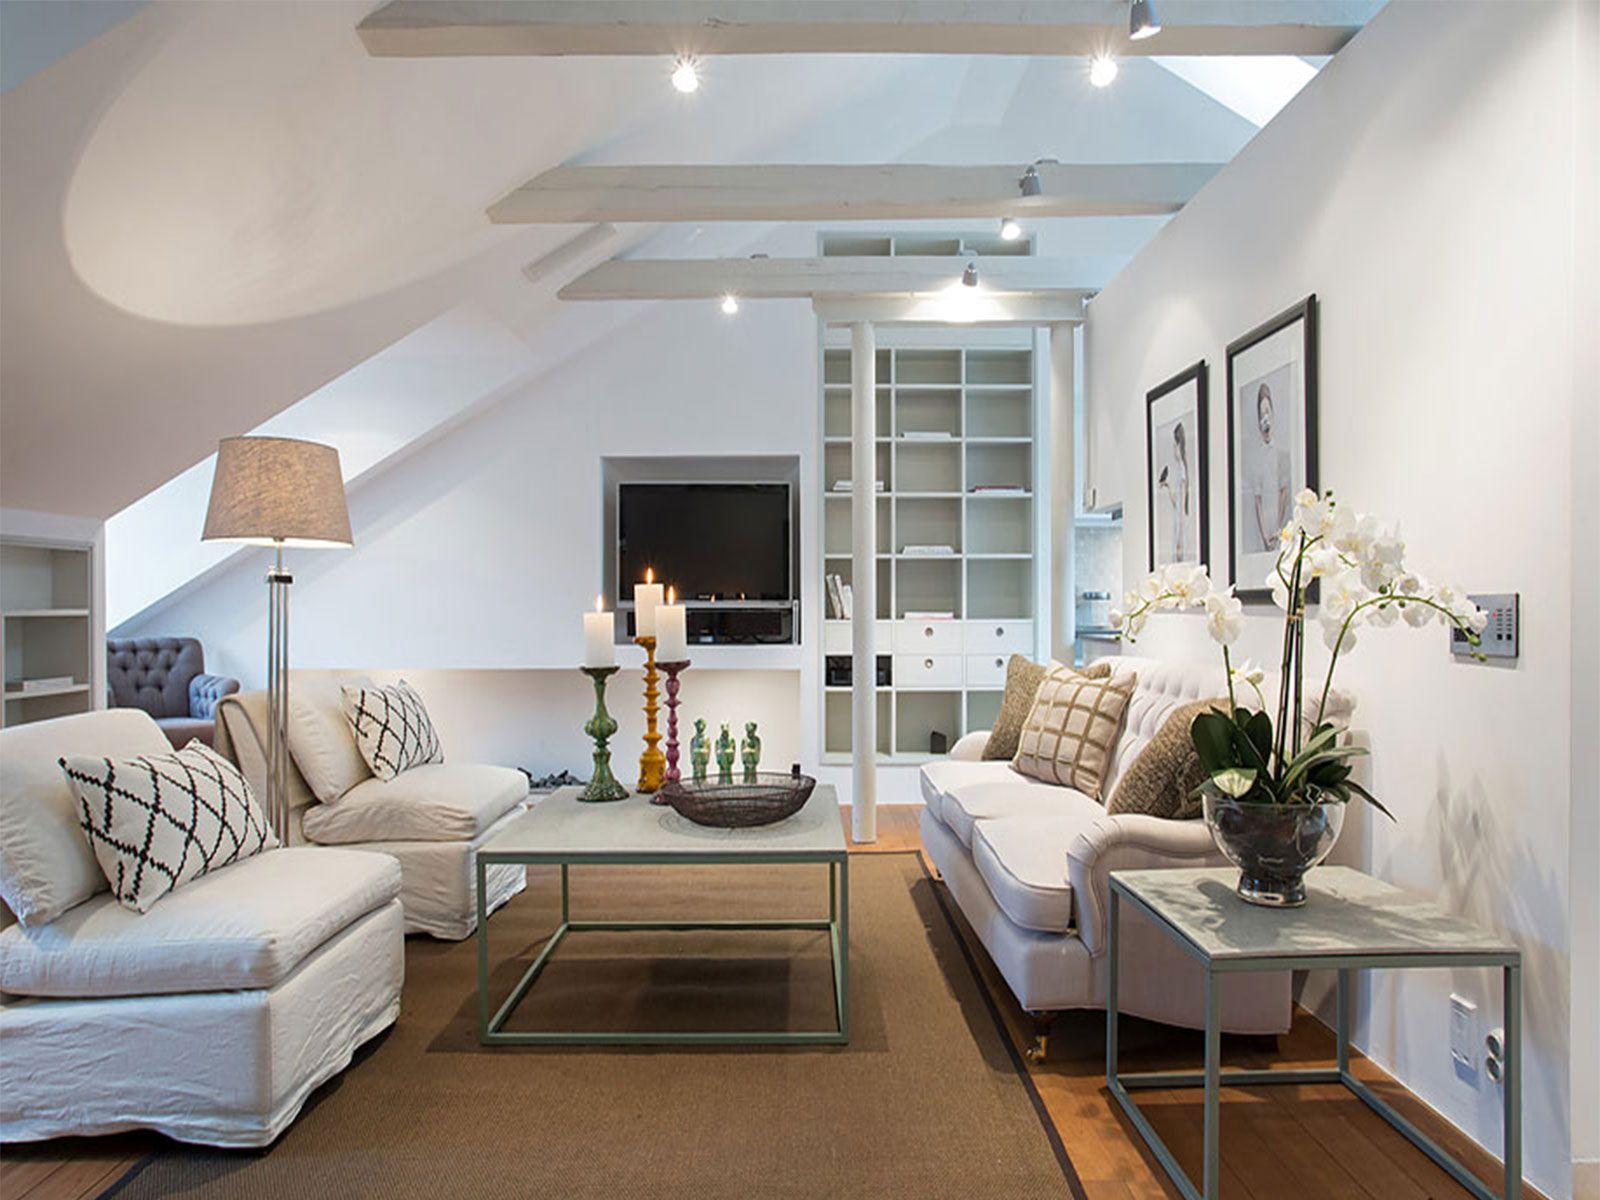 19 Timeless Attic Design Ideas That You Shouldnt Miss Attic Living Rooms Attic Renovation Attic Rooms